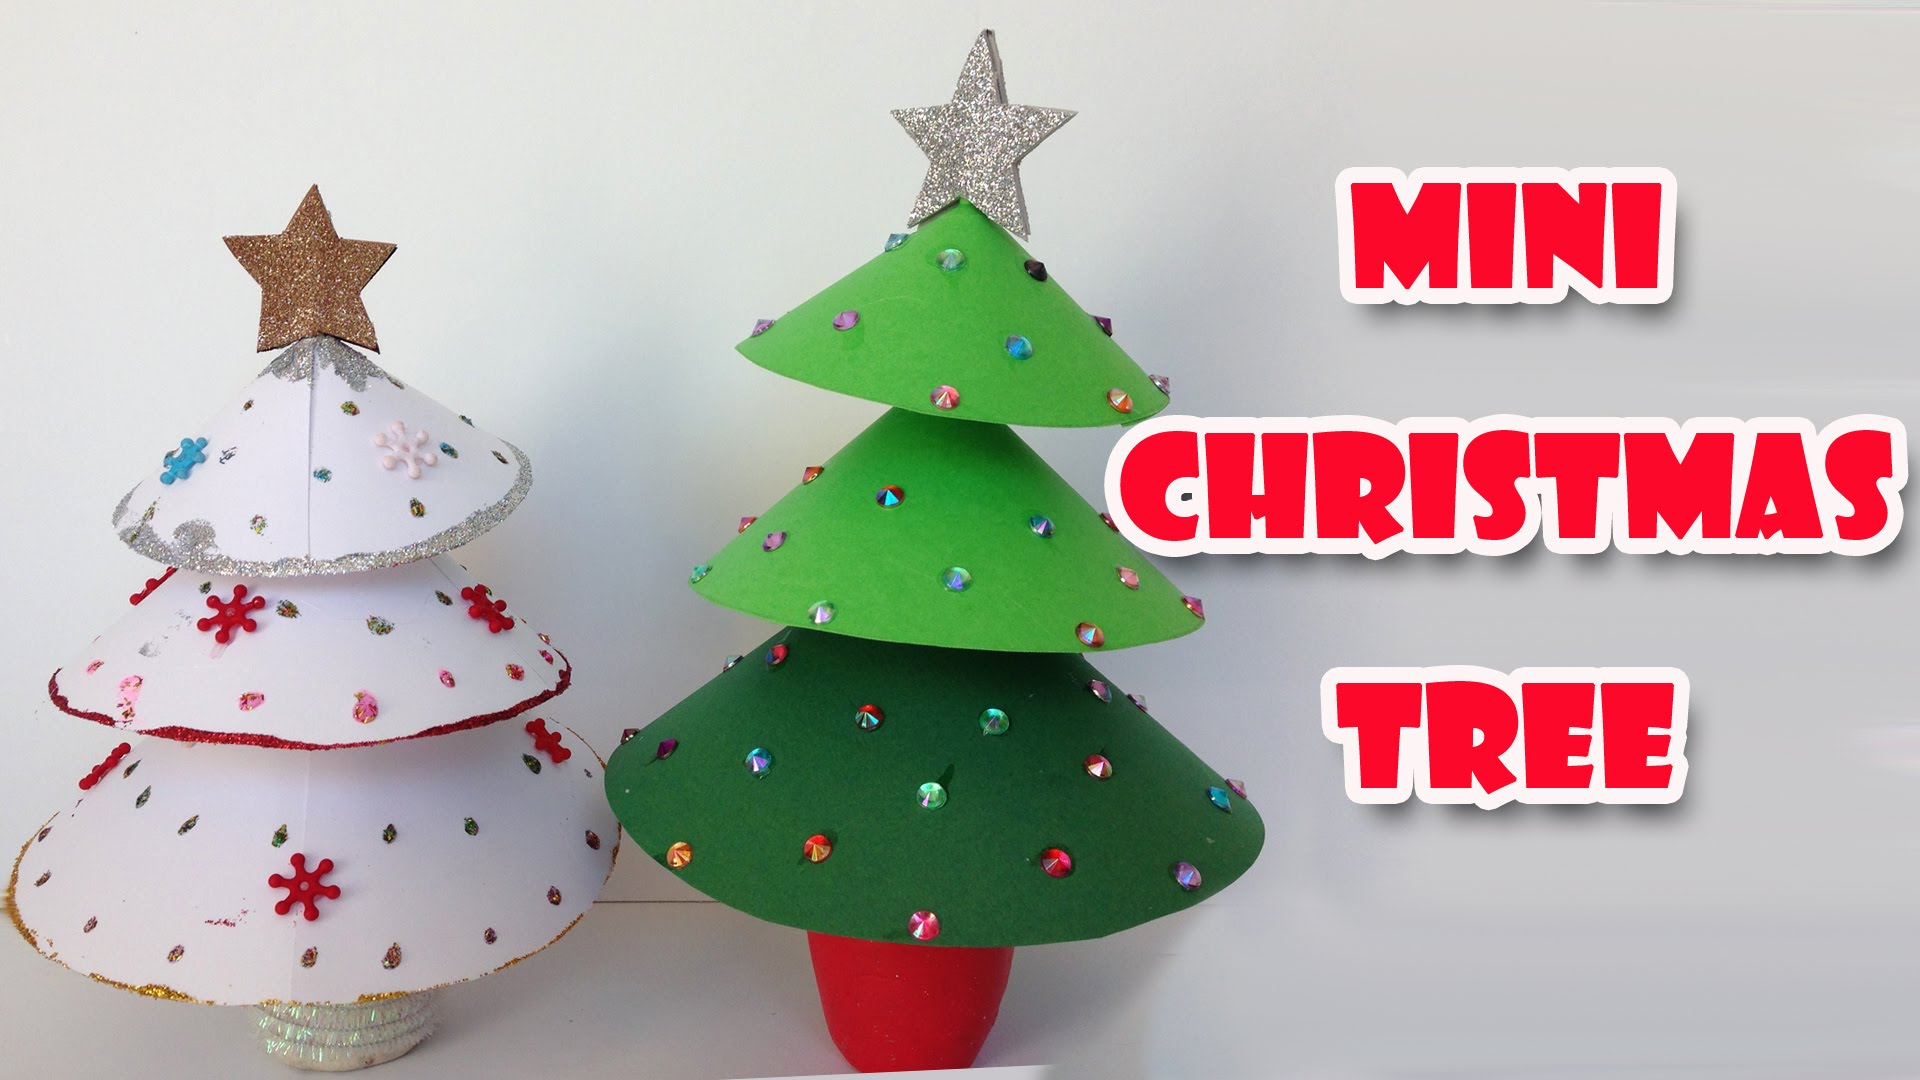 DIY christmas crafts | Mini christmas tree - EASY!! Ana | DIY Crafts ...